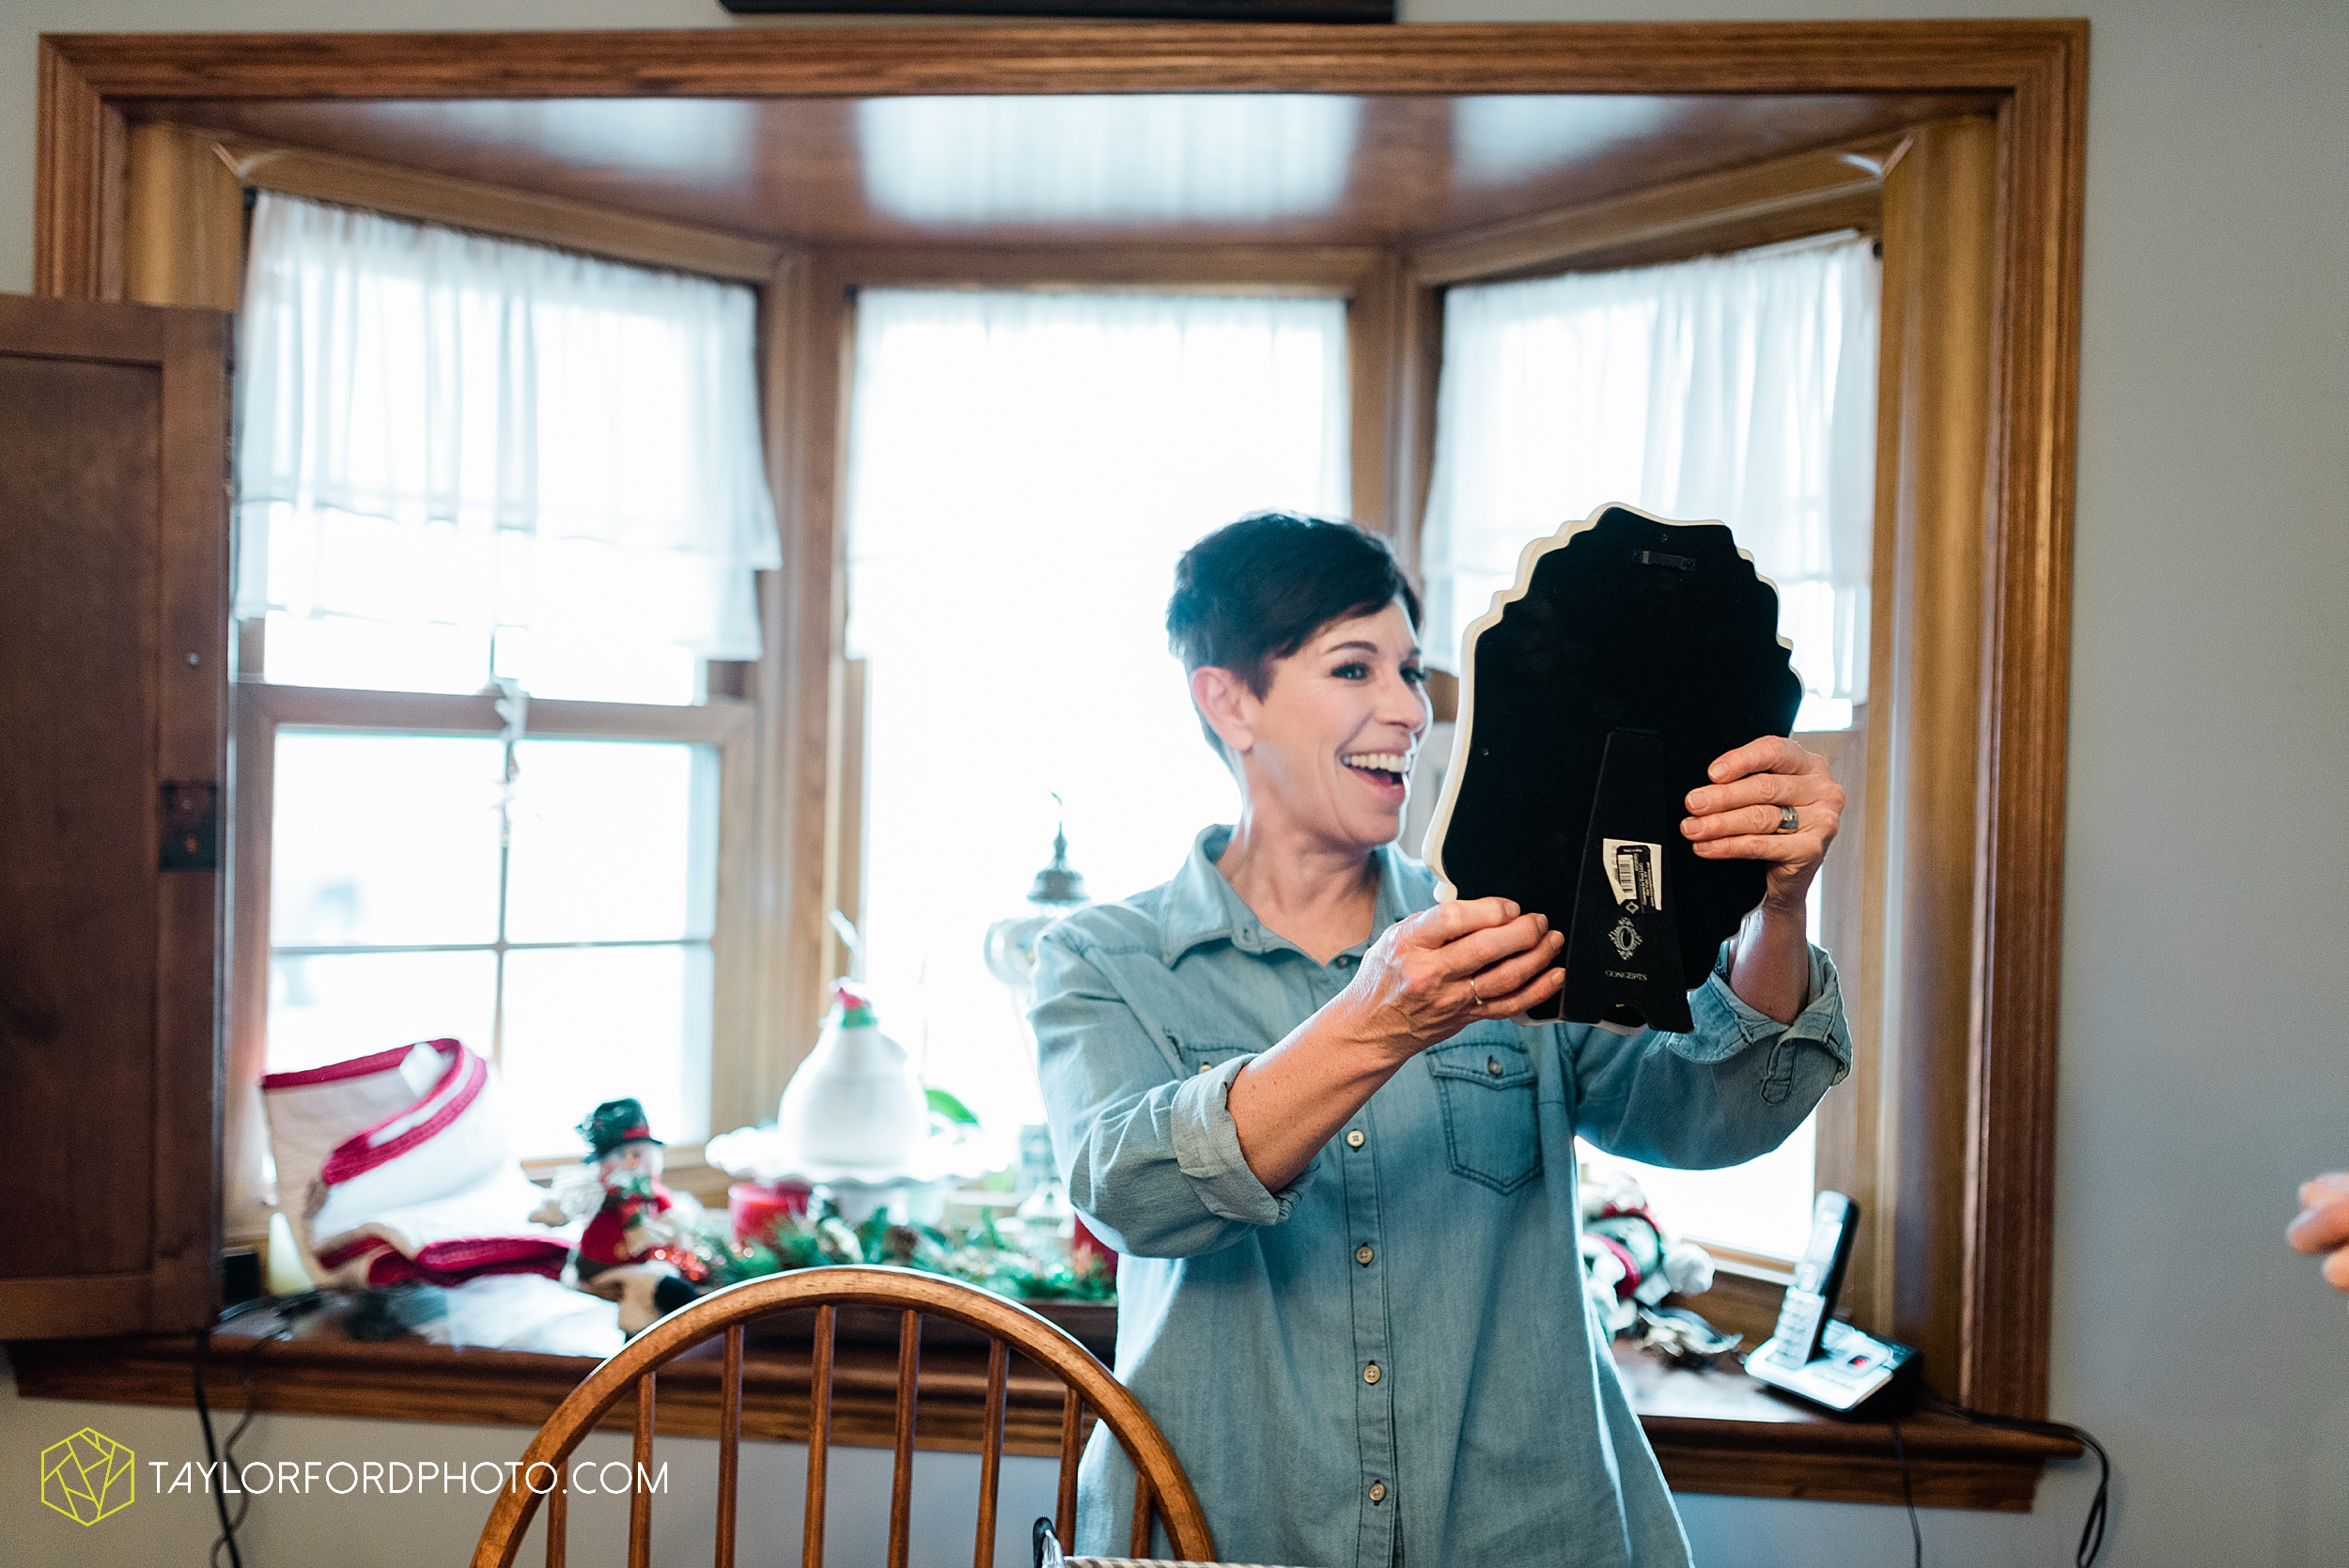 van-wert-ohio-first-united-methodist-downtown-van-wert-county-jr-fair-building-reception-winter-christmas-wedding-photographer-taylor-ford-hirschy-photographer_1863.jpg